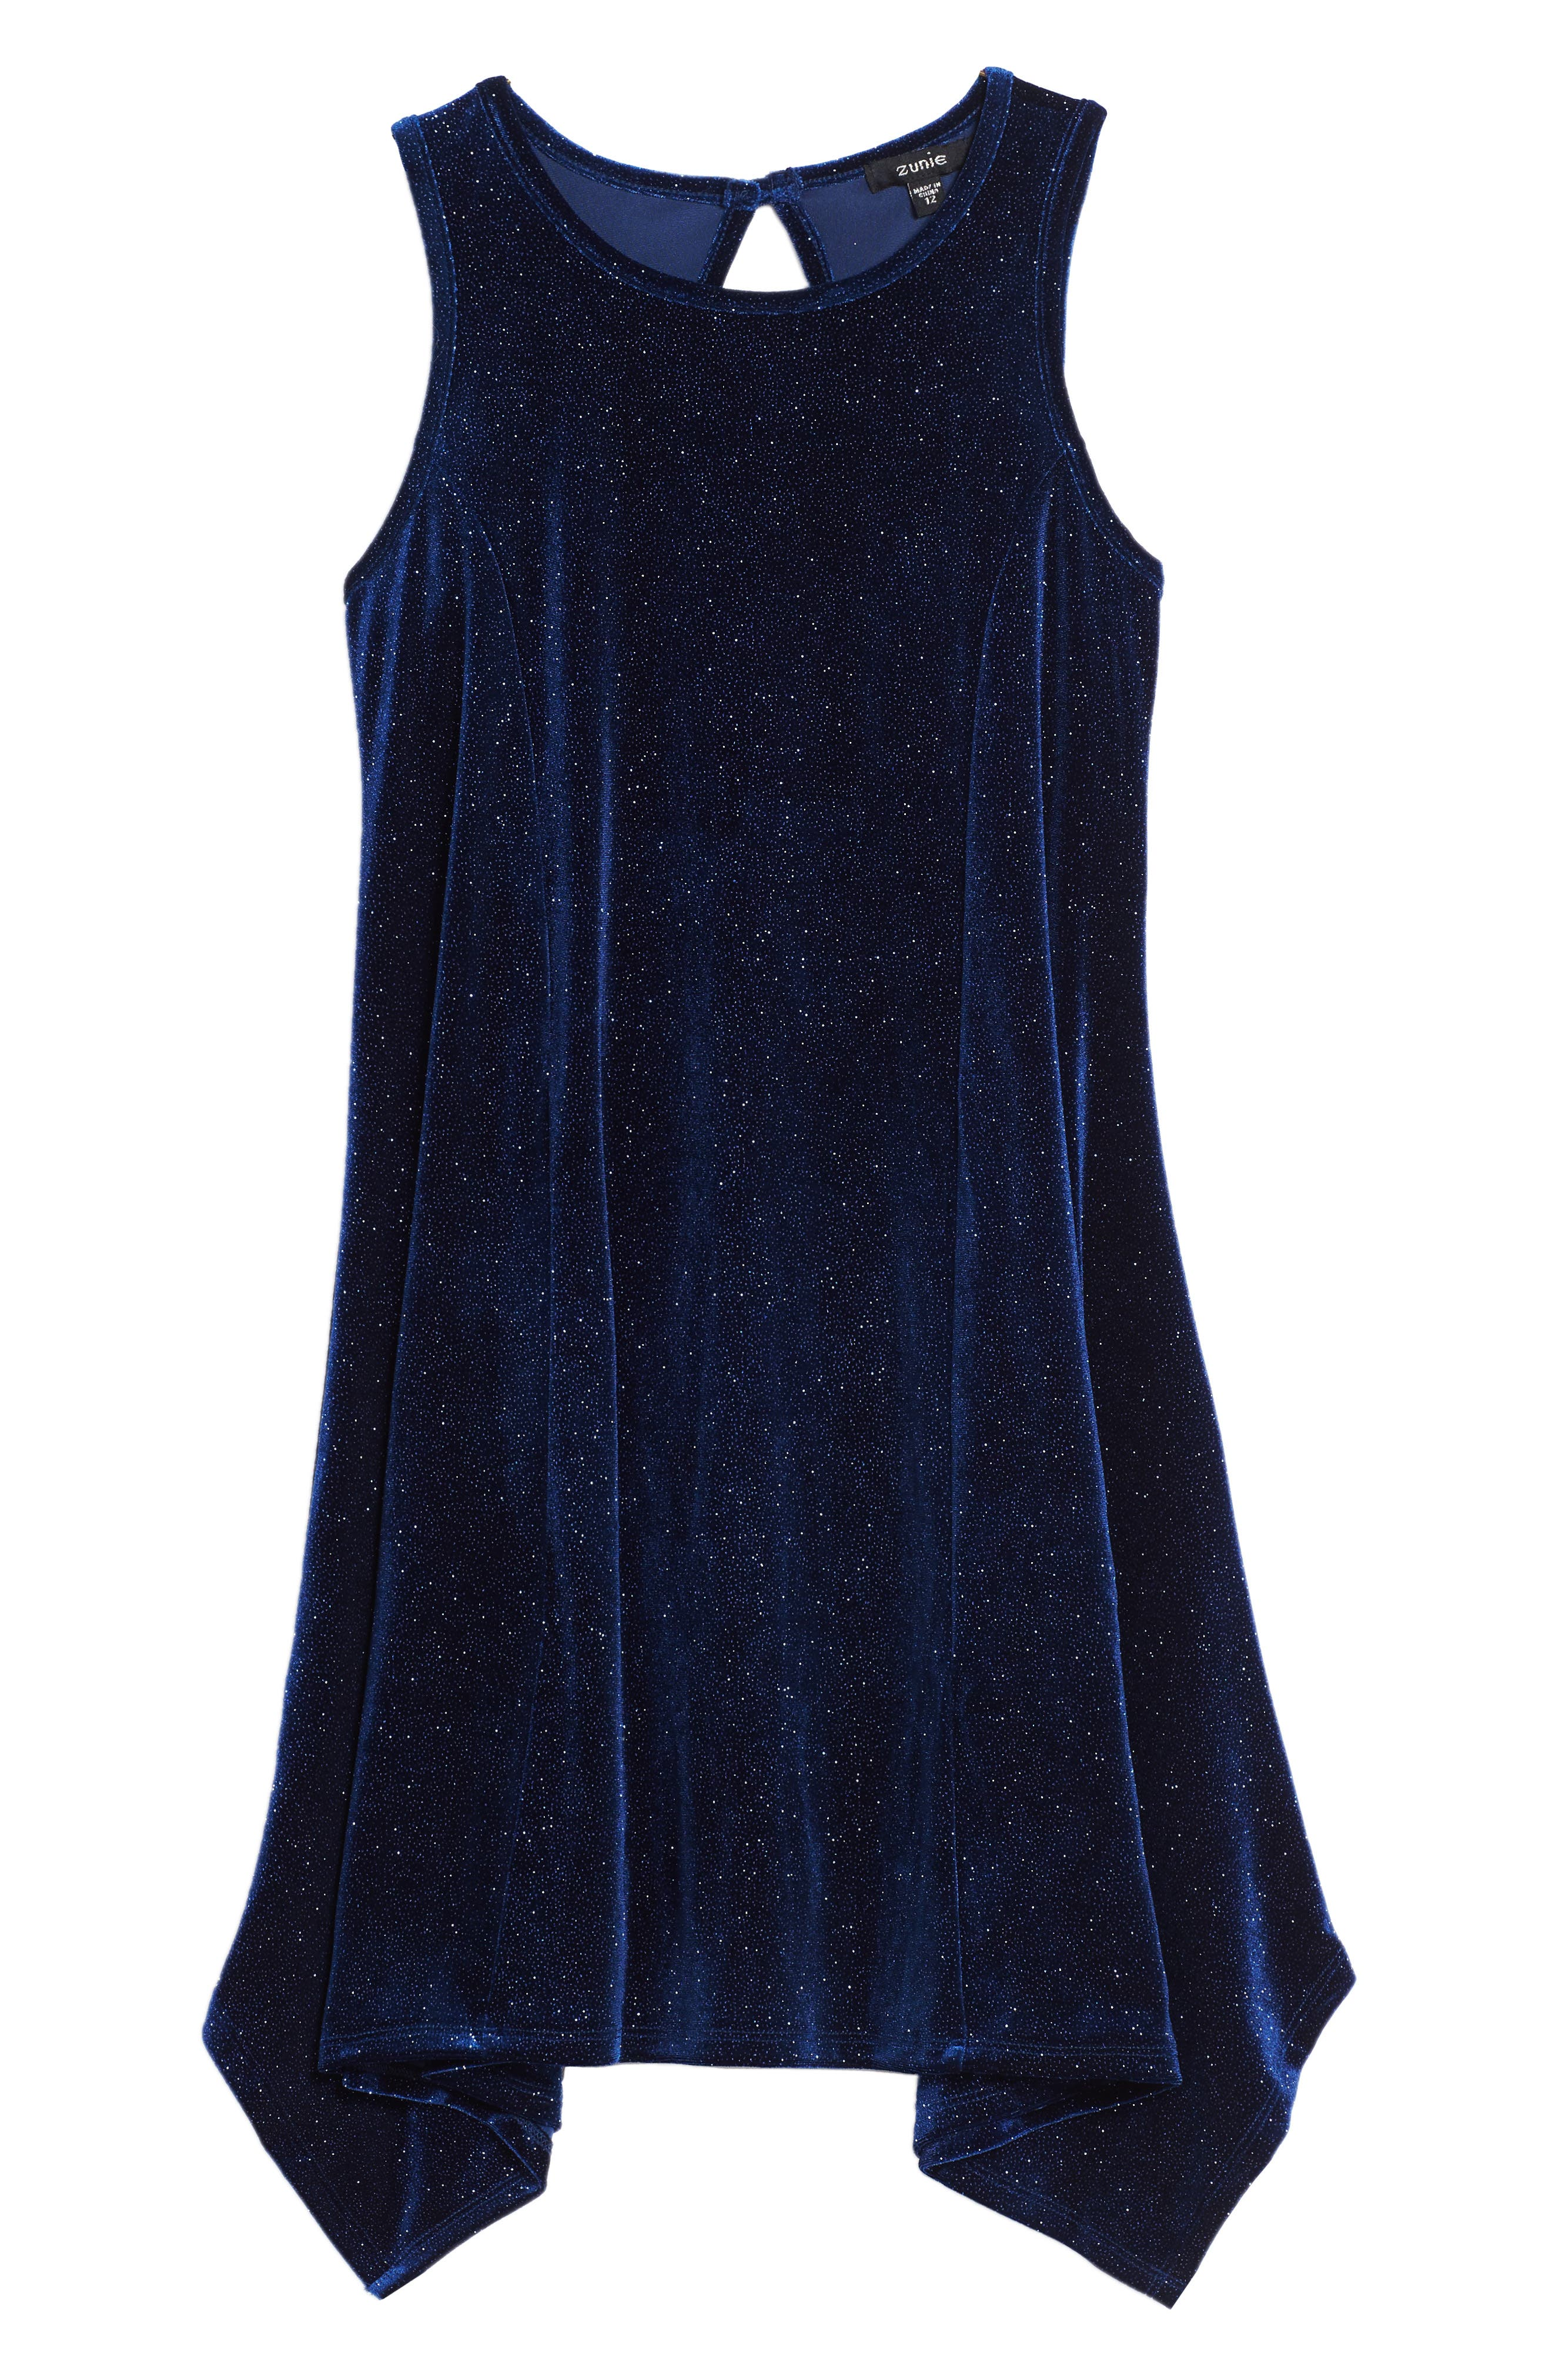 Main Image - Zunie Shimmer Sharkbite Dress (Big Girls)